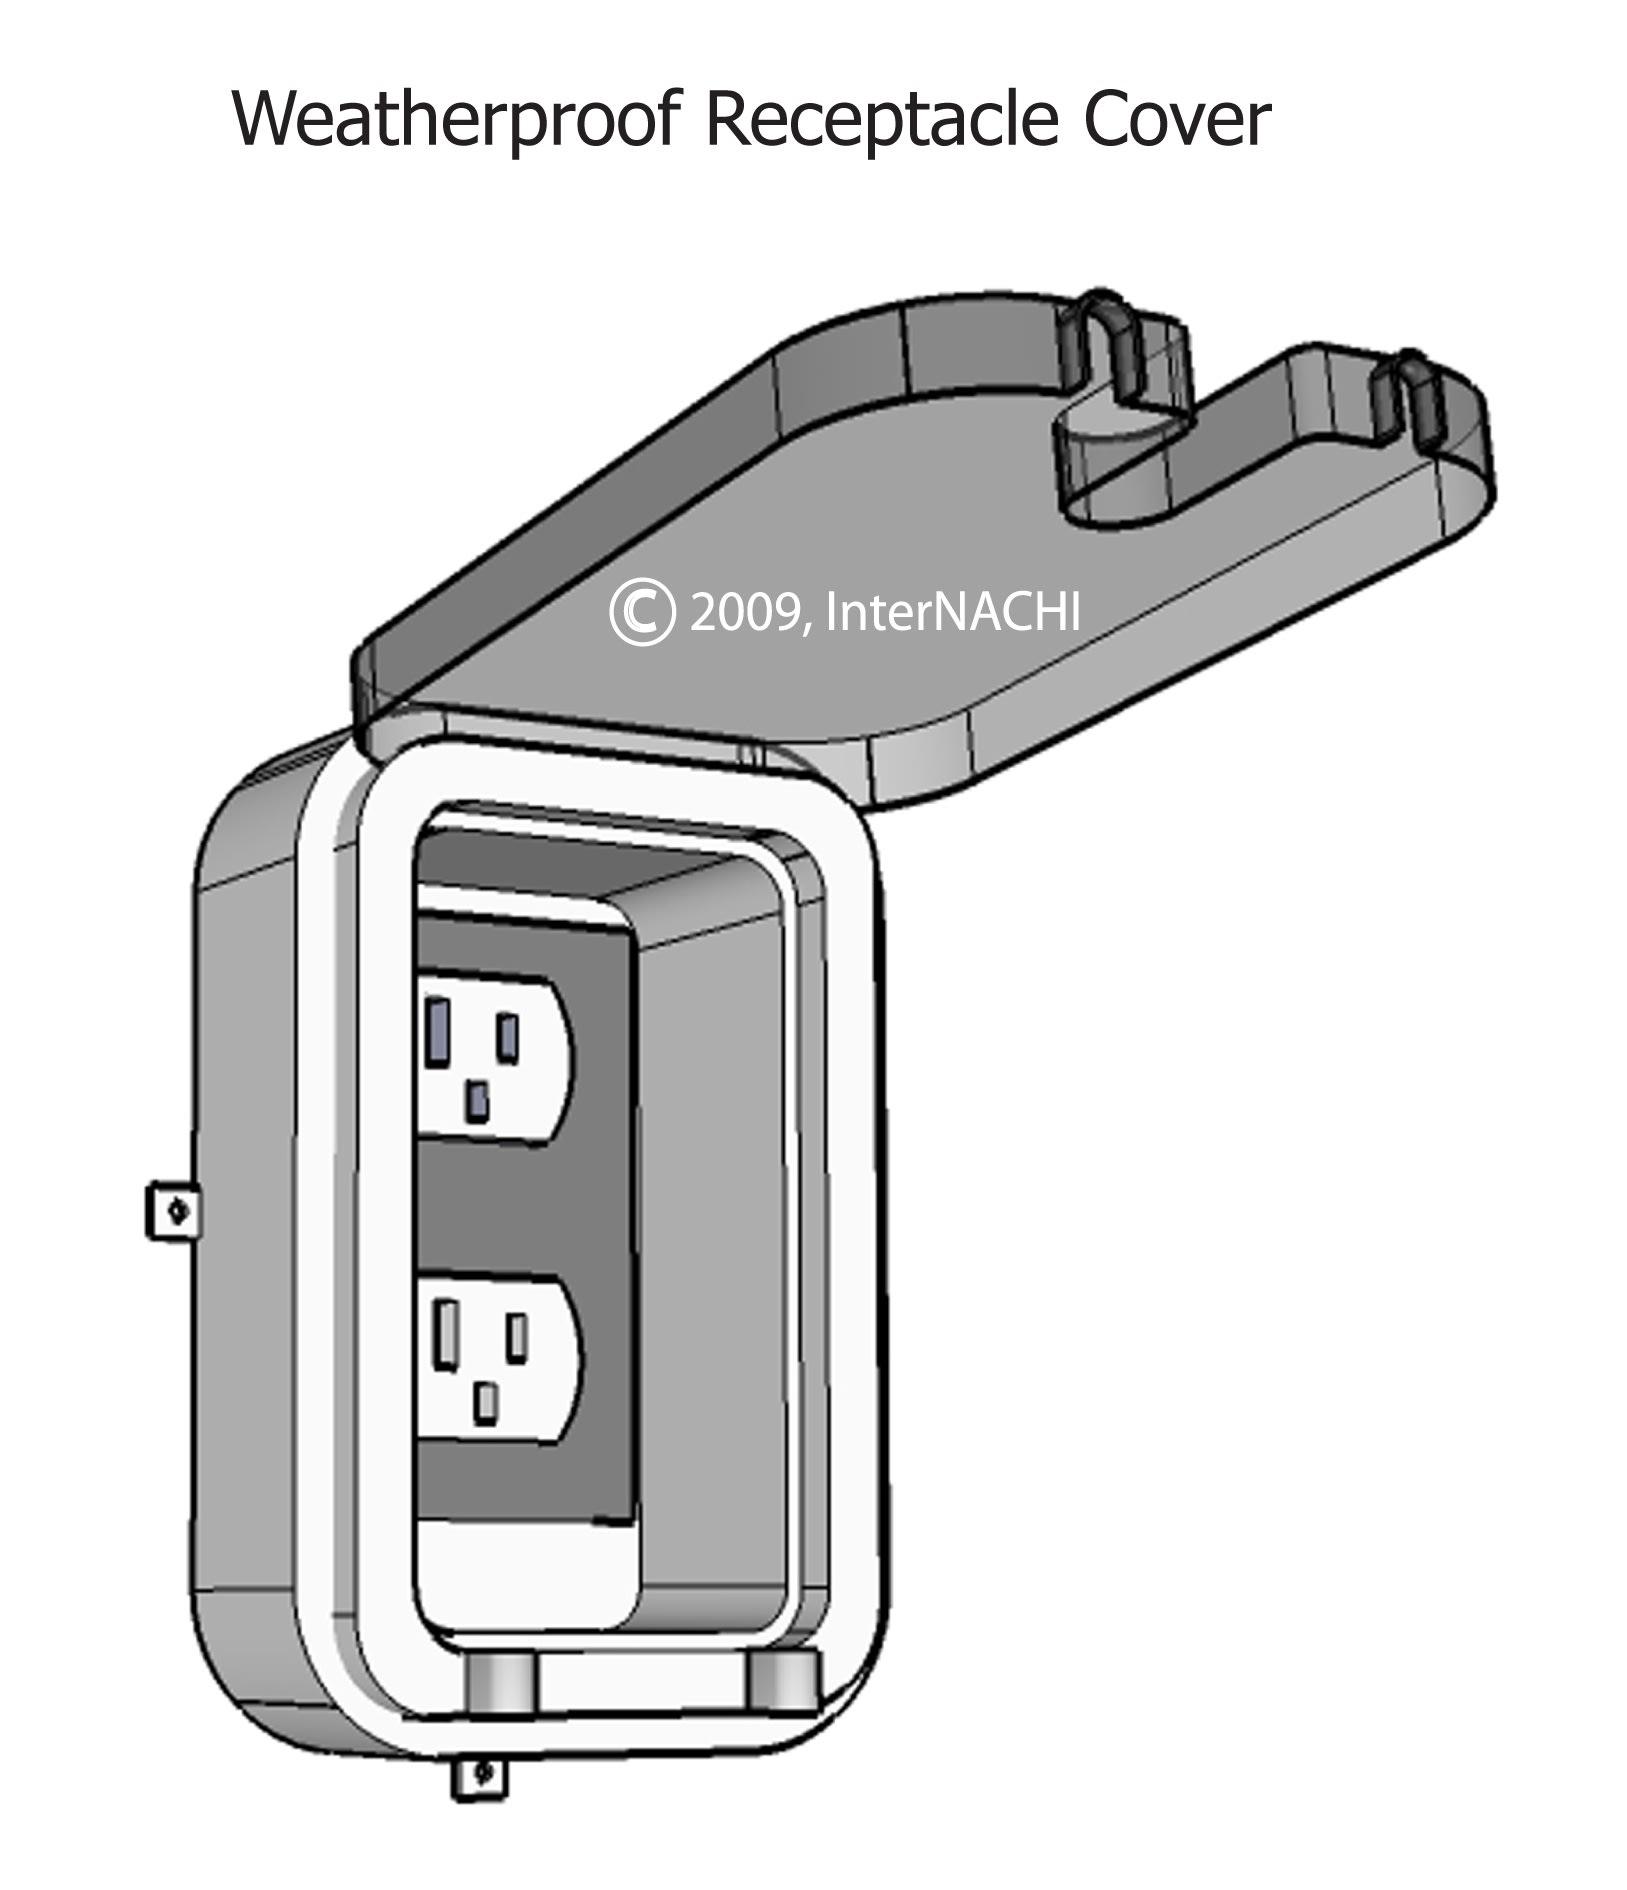 Weatherproof receptacle cover.